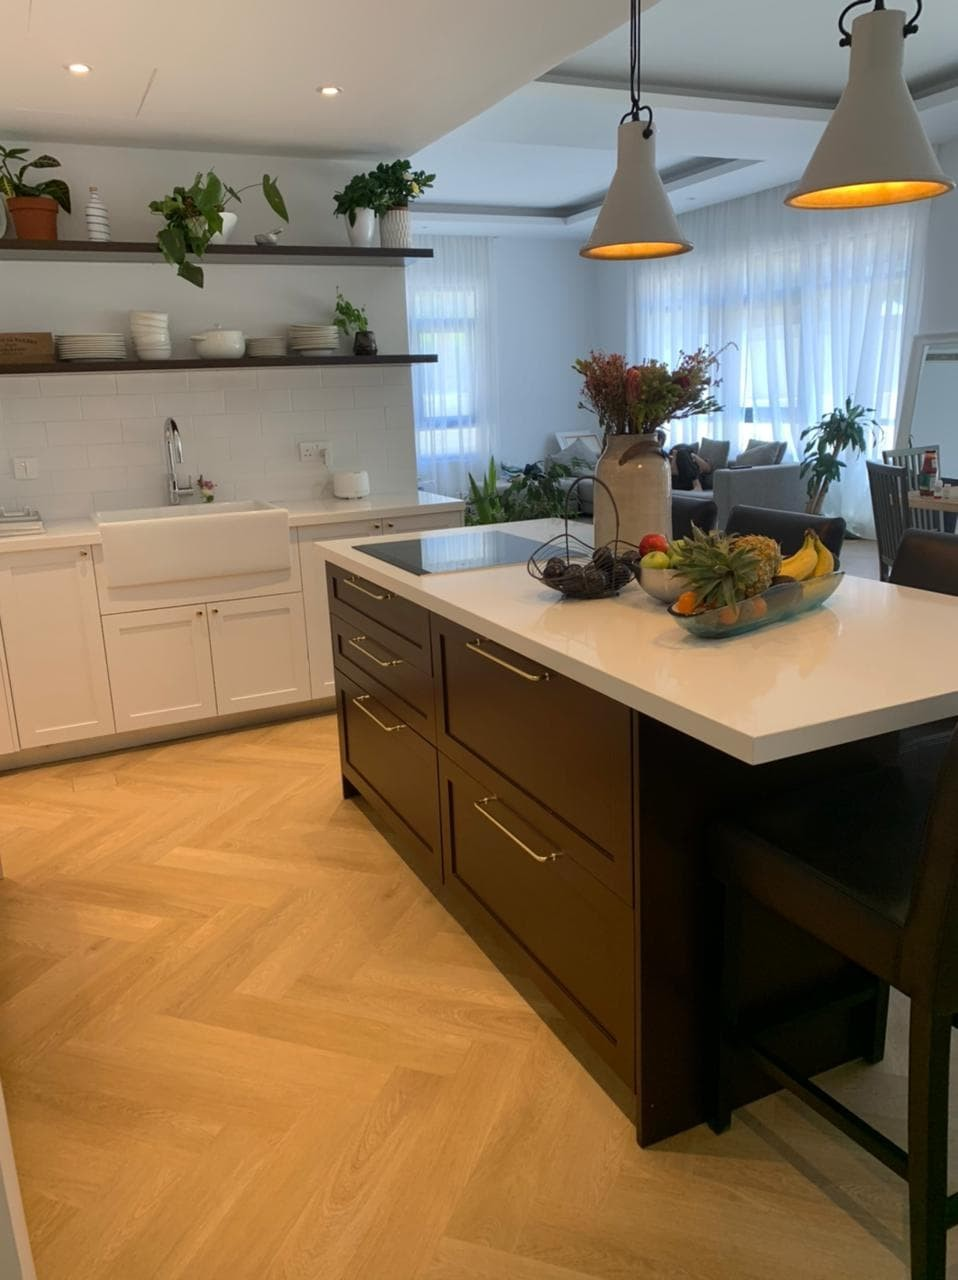 Greens 3 bedroom apartment renovation